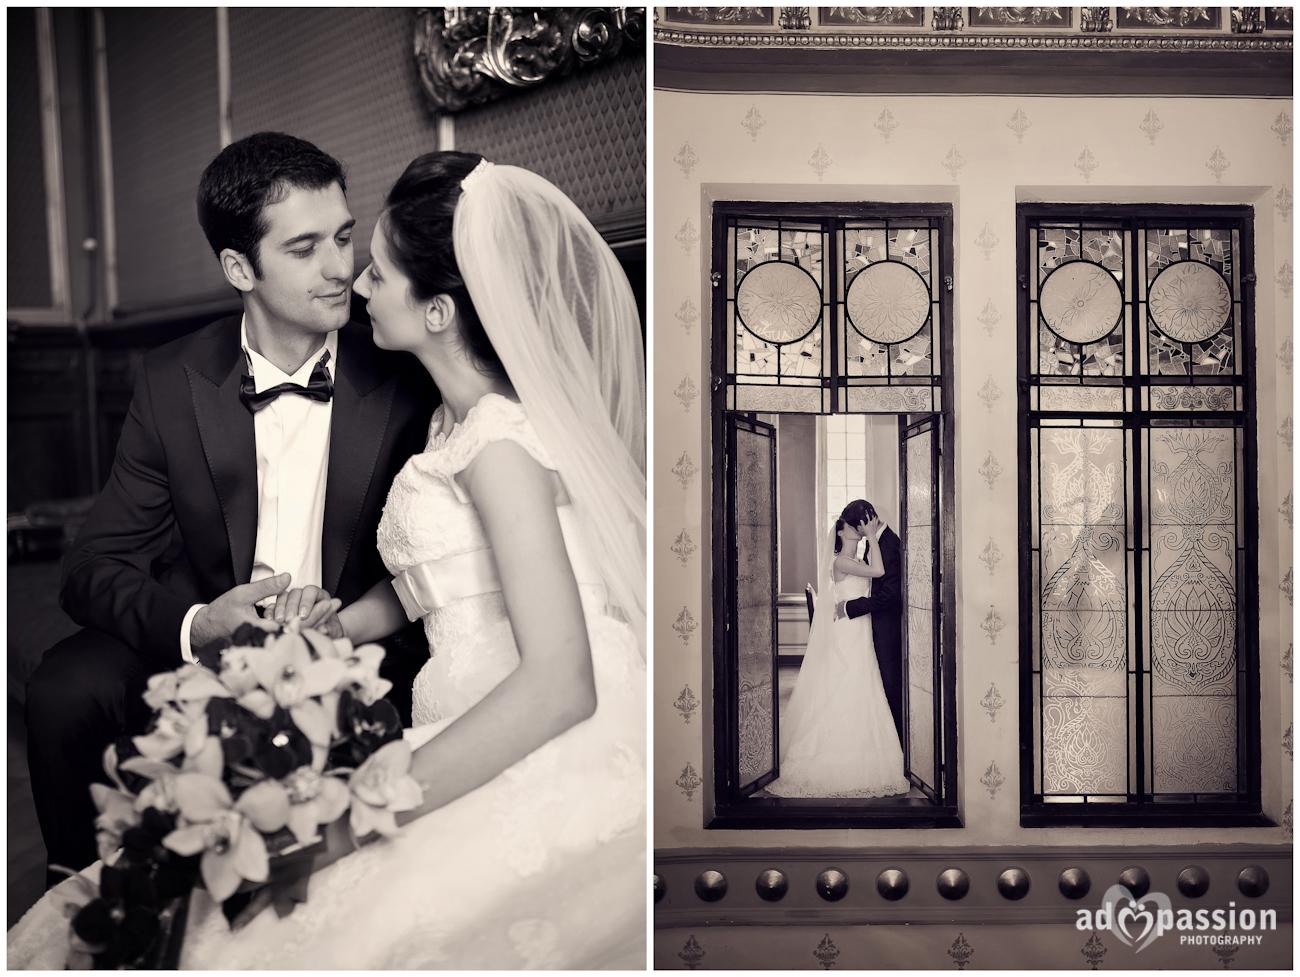 AD Passion Photography | 2011-05-22-Miriam&Florin_26 | Adelin, Dida, fotograf profesionist, fotograf de nunta, fotografie de nunta, fotograf Timisoara, fotograf Craiova, fotograf Bucuresti, fotograf Arad, nunta Timisoara, nunta Arad, nunta Bucuresti, nunta Craiova